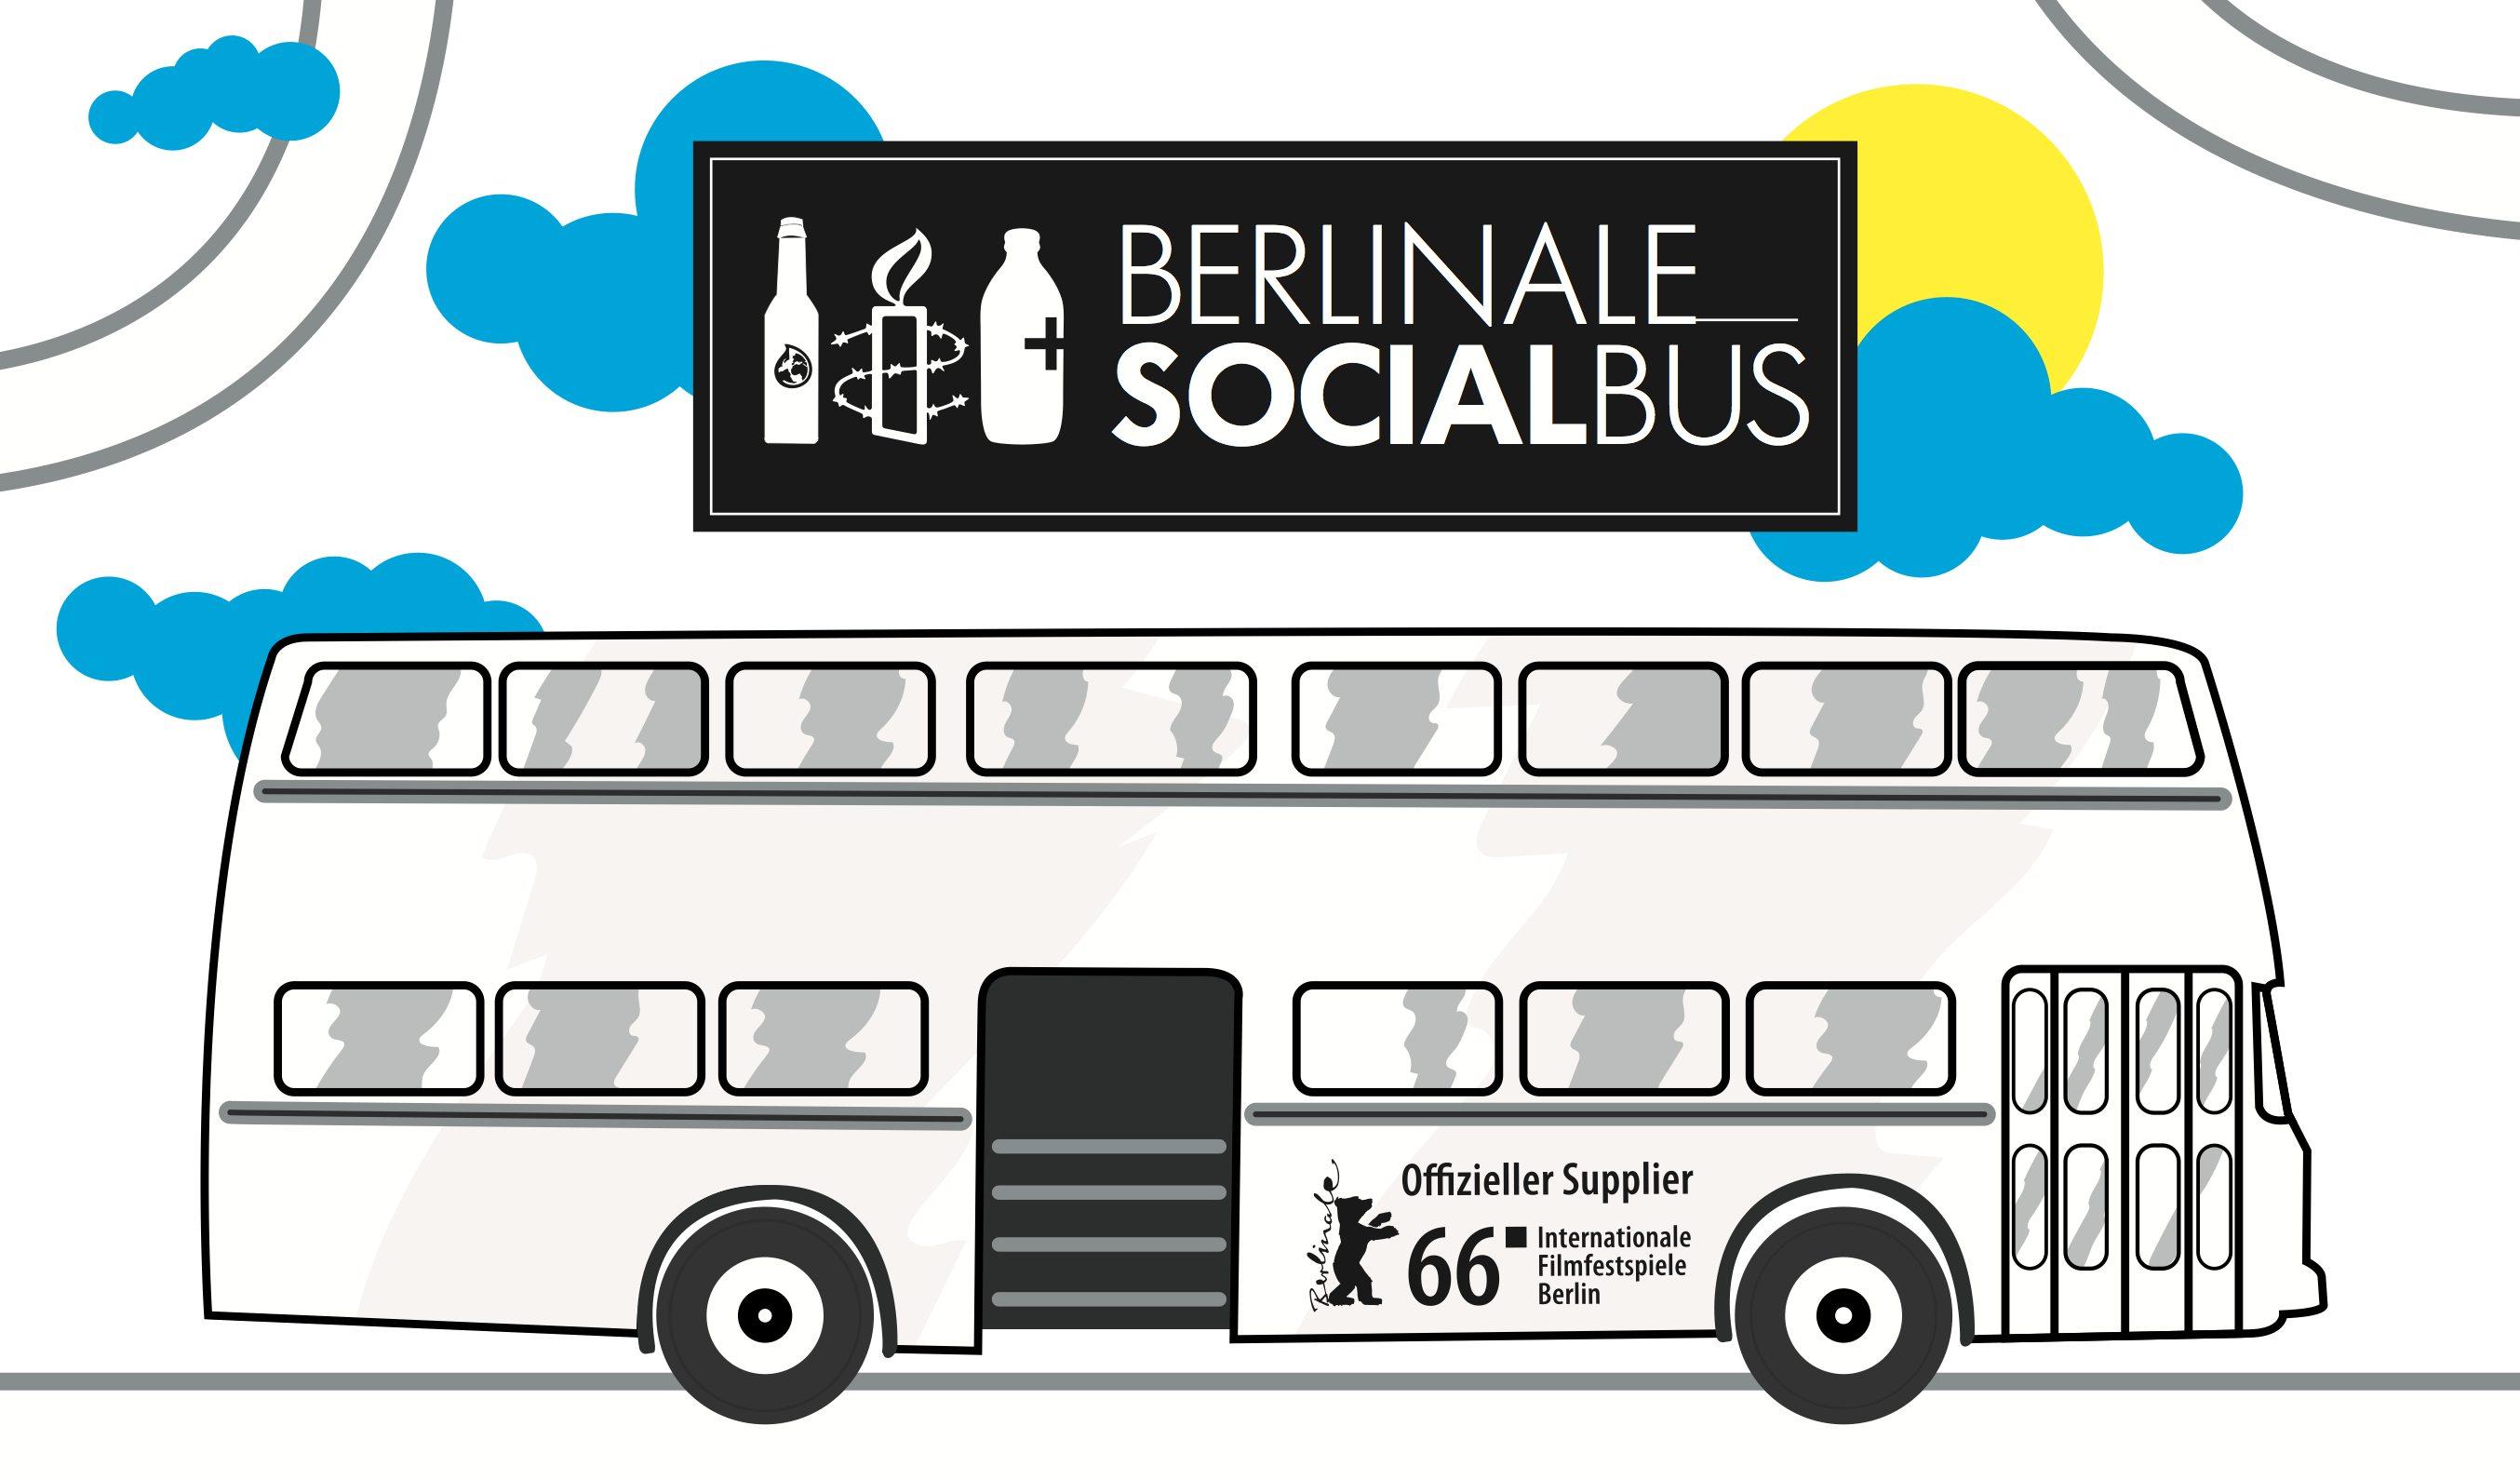 Berlinale_Social_Bus